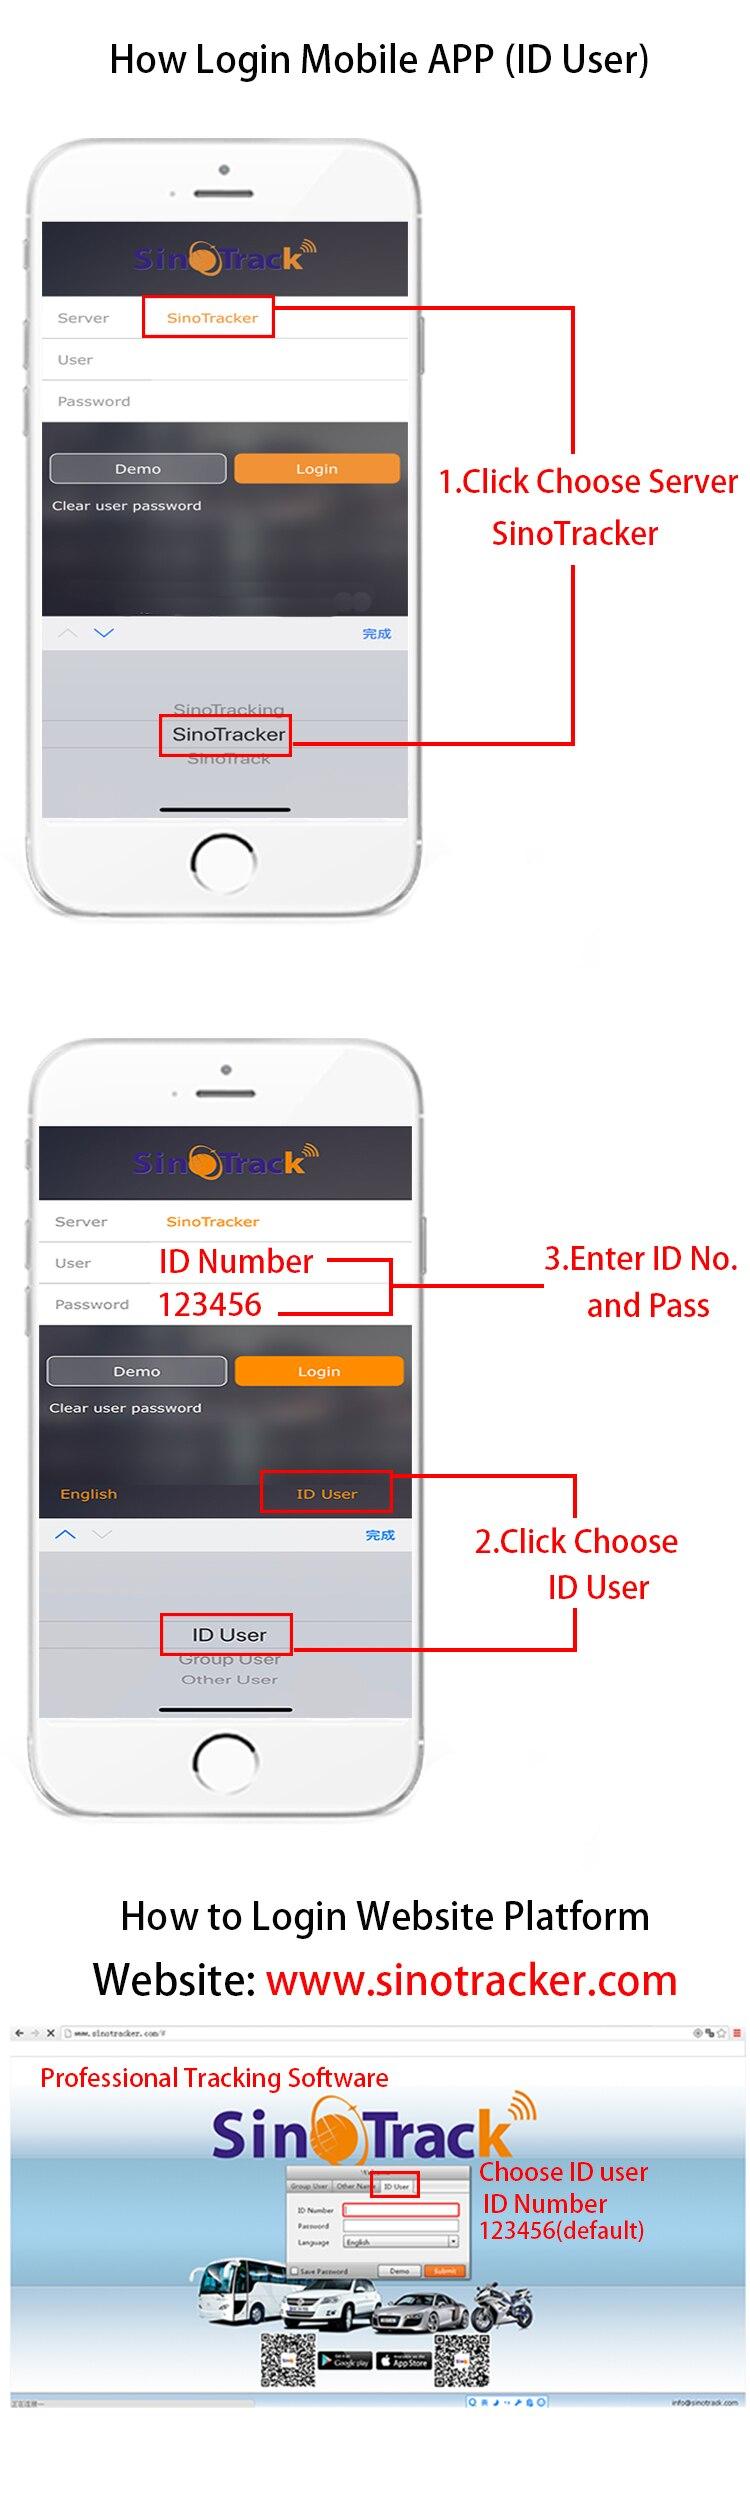 how to login sinotracker